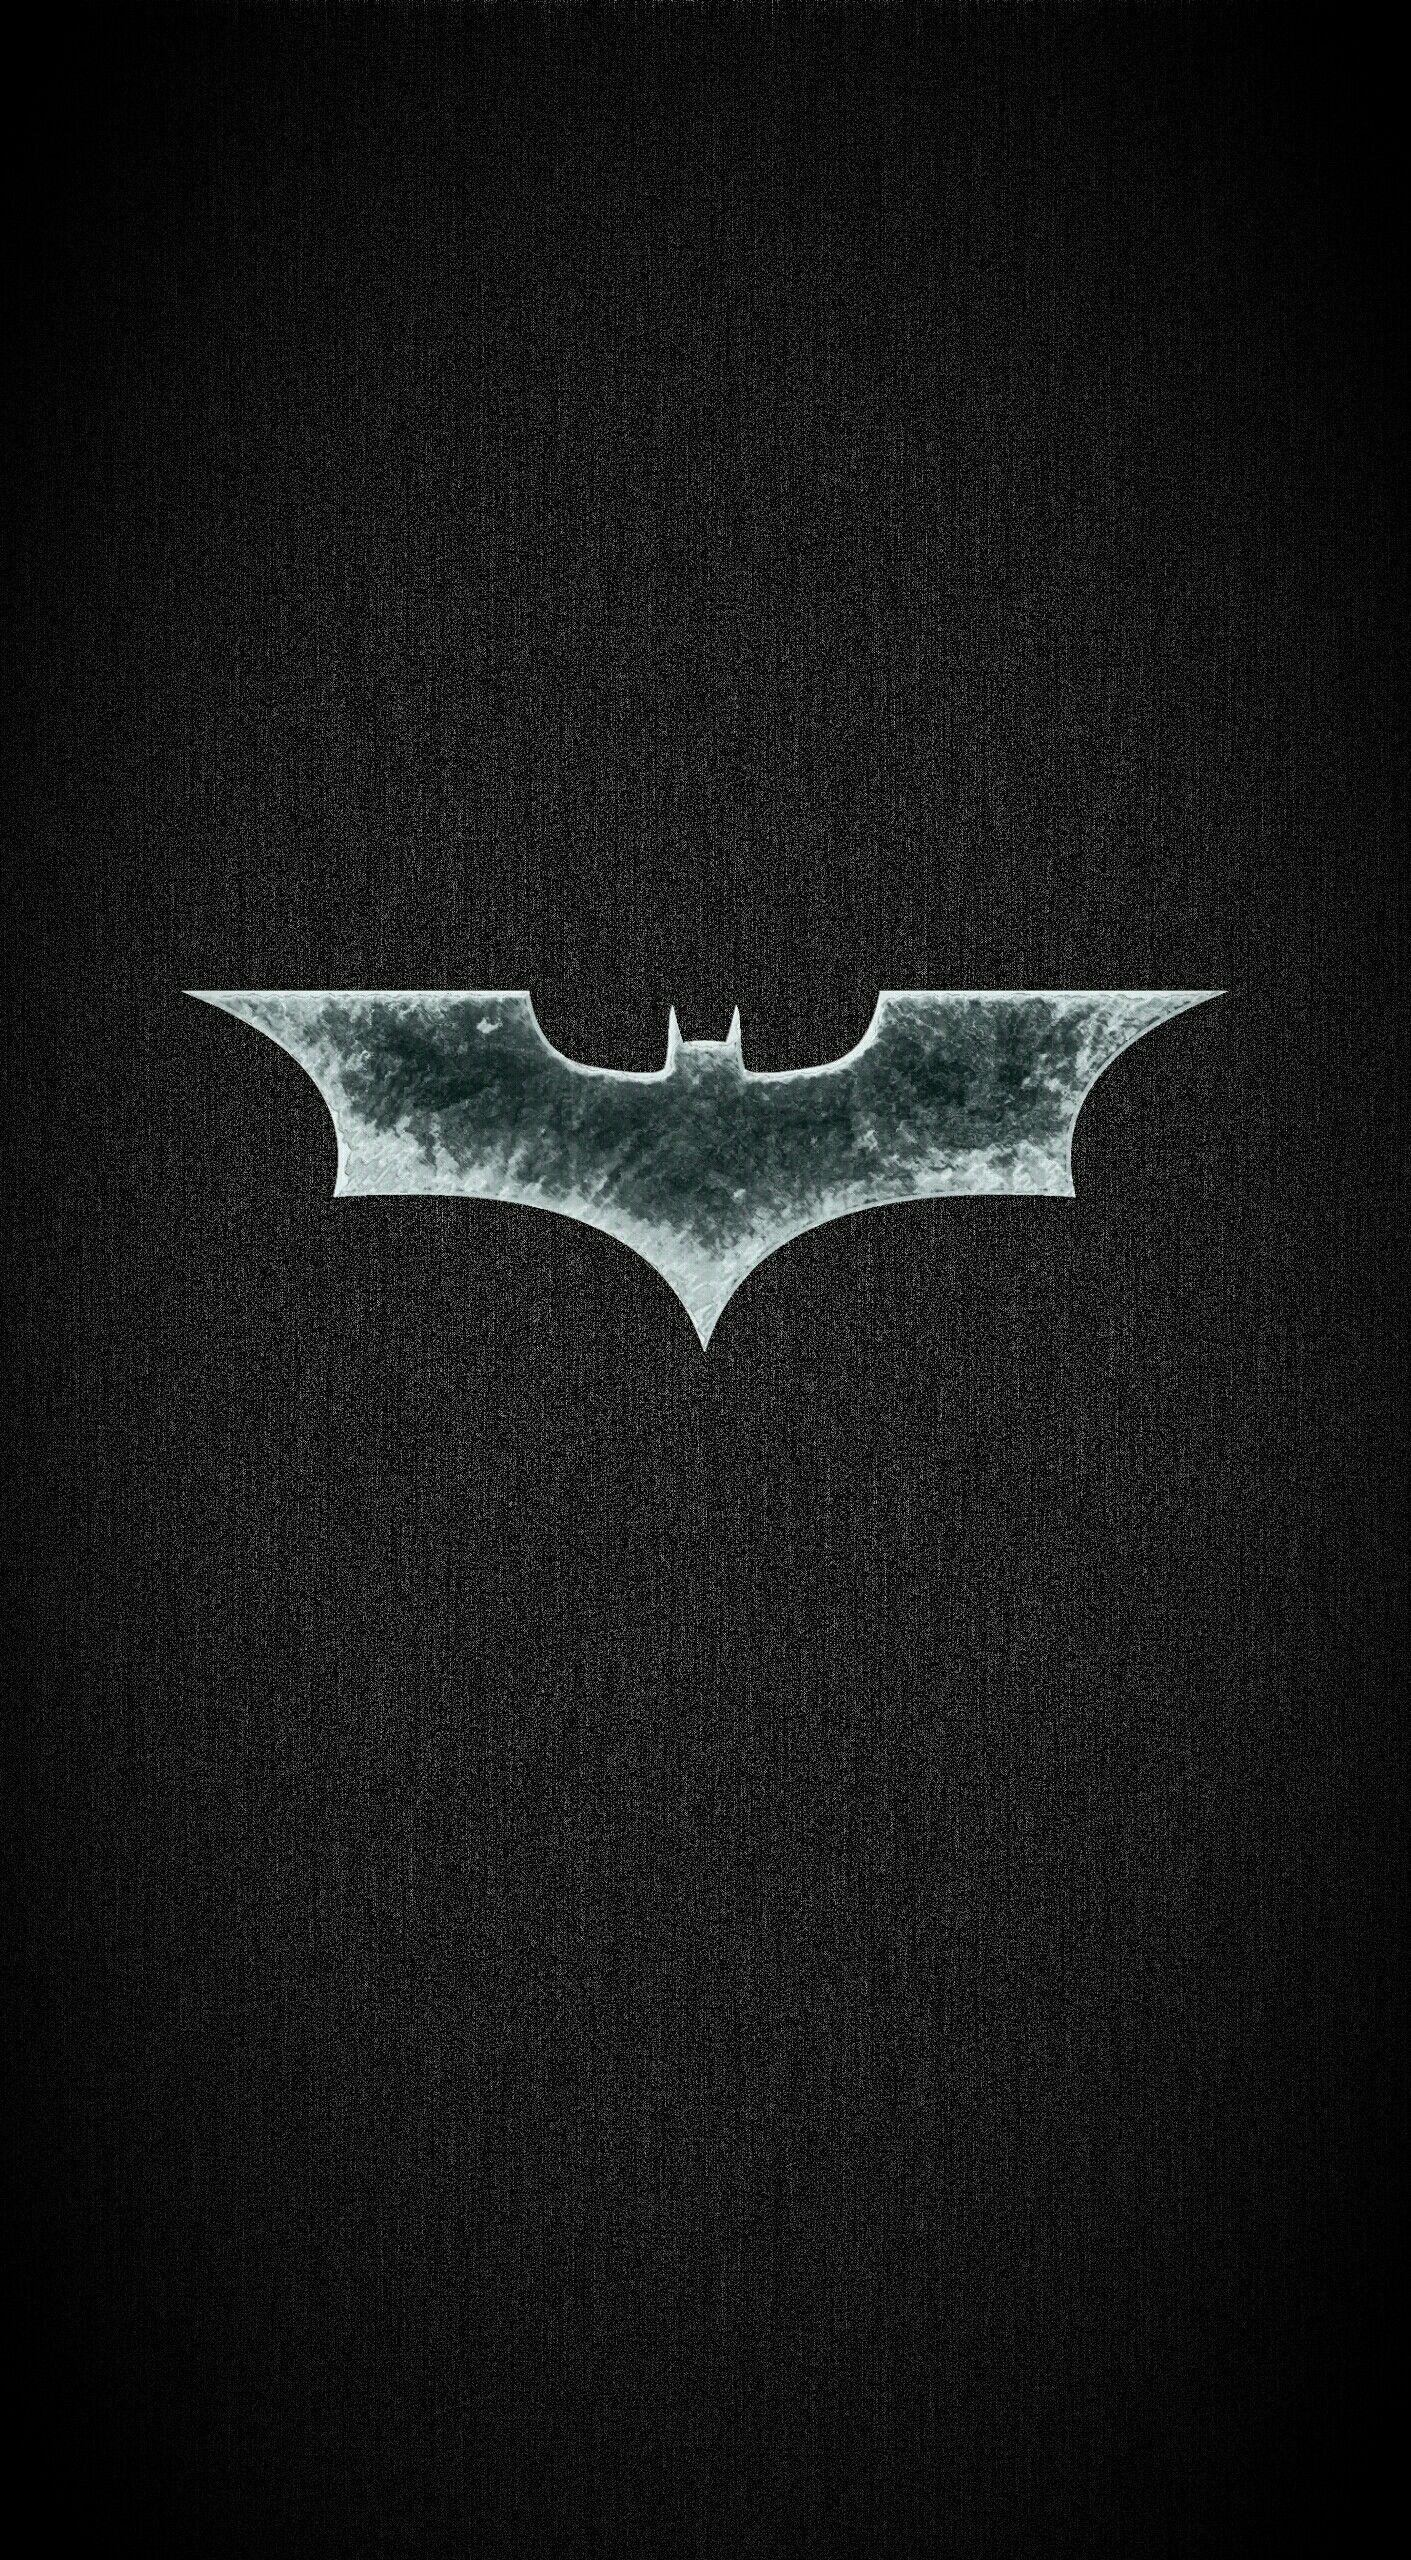 Batman Wallpaper Hd 1080x1920 Batman Wallpaper Hd Batman Wallpaper Batman Artwork